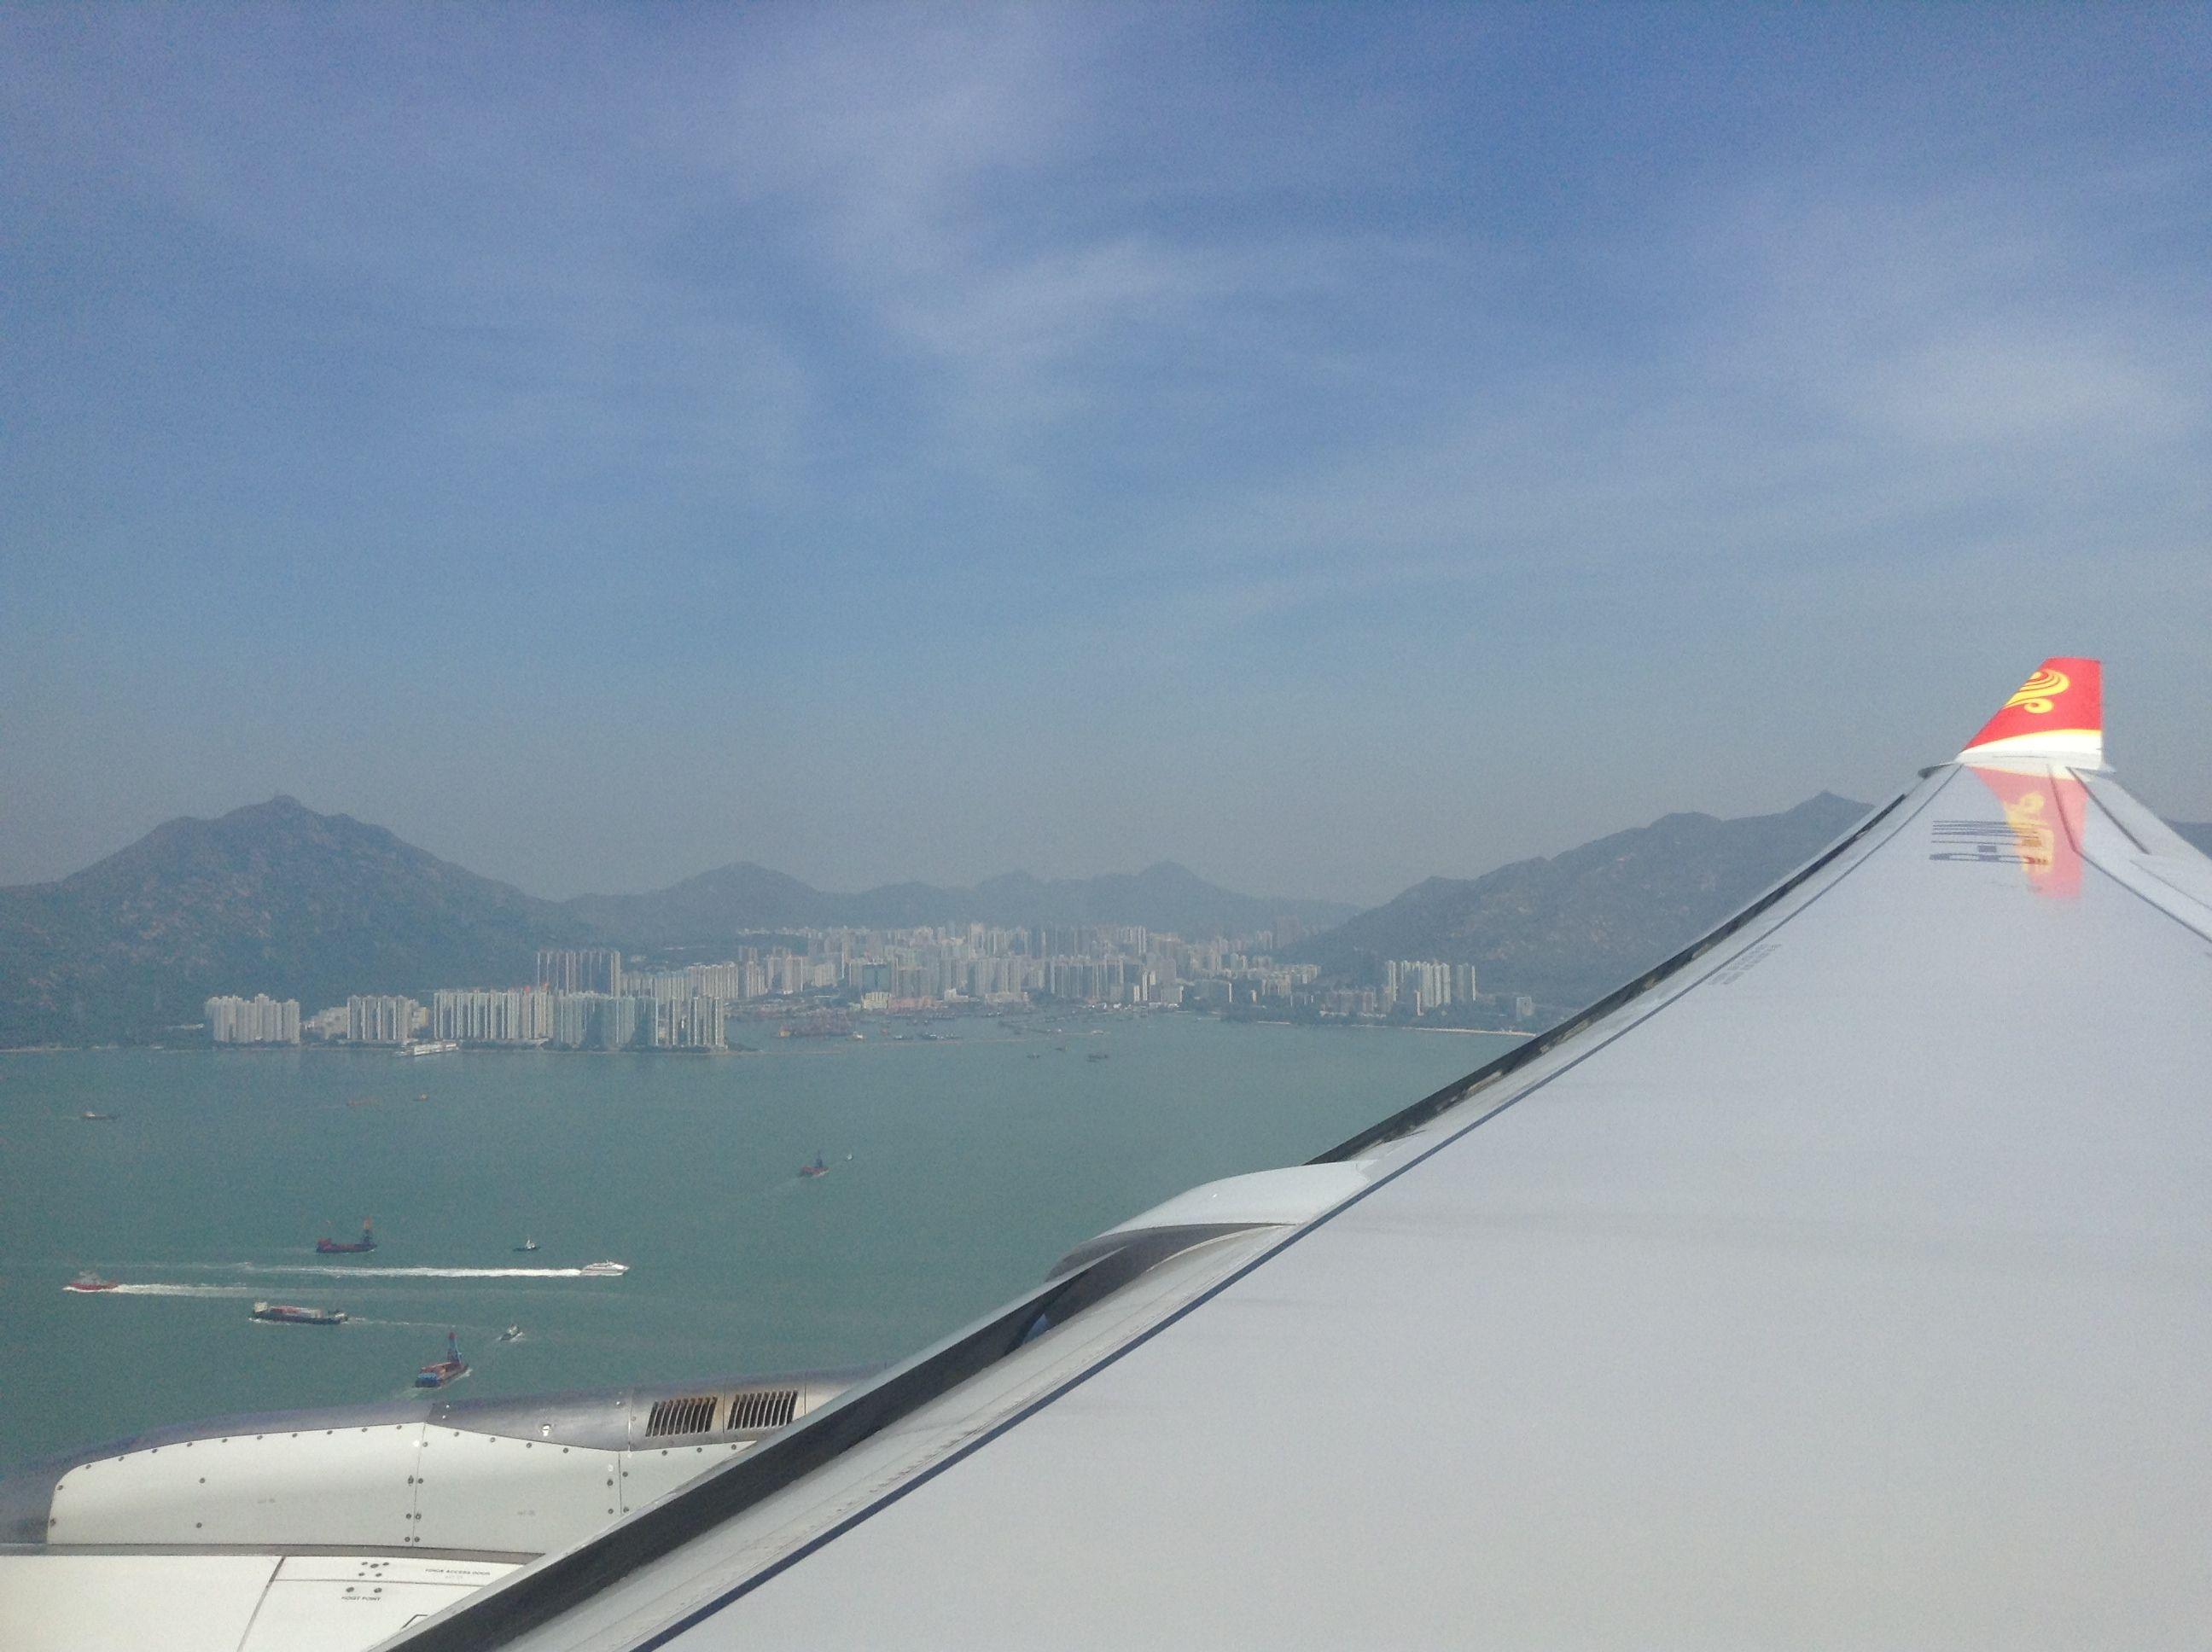 My HK view